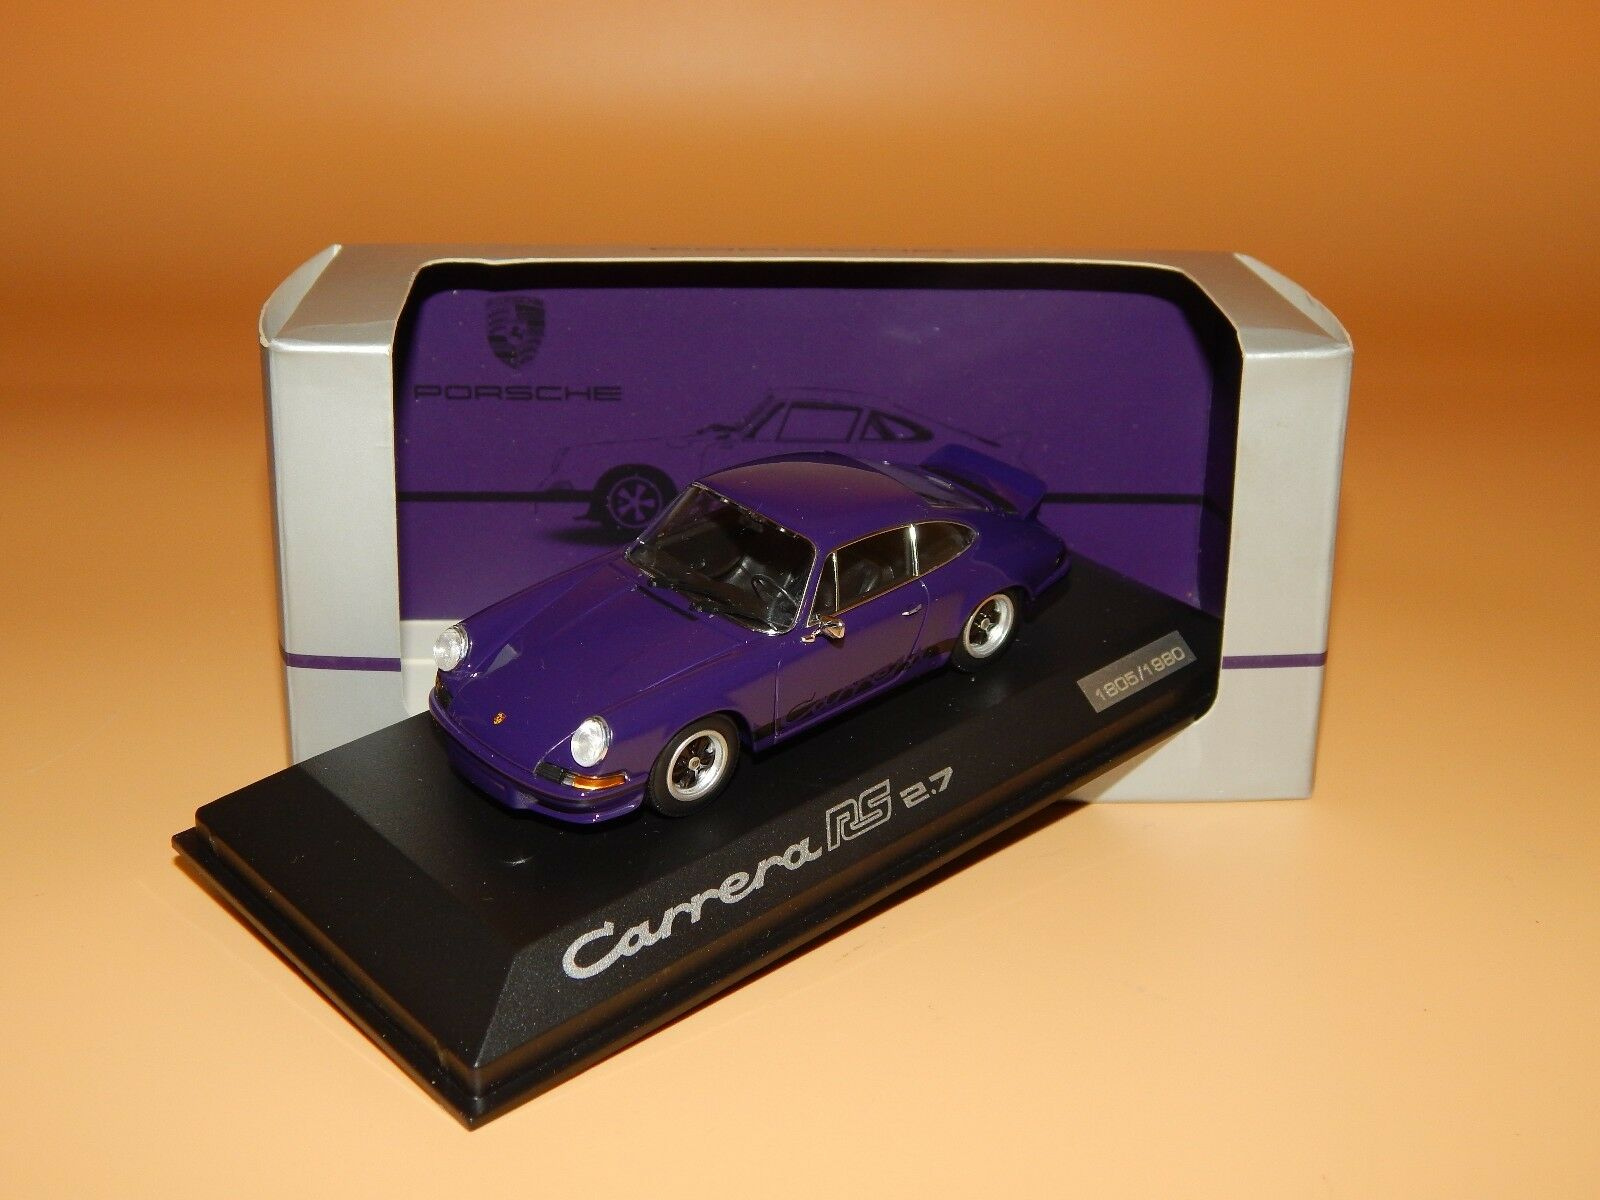 Porsche 911 Carrera Carrera Carrera RS 2.7 1980 Violet PORSCHE Dealers-Box PMA-Minichamps 1 43 Neuf dans sa boîte c39256